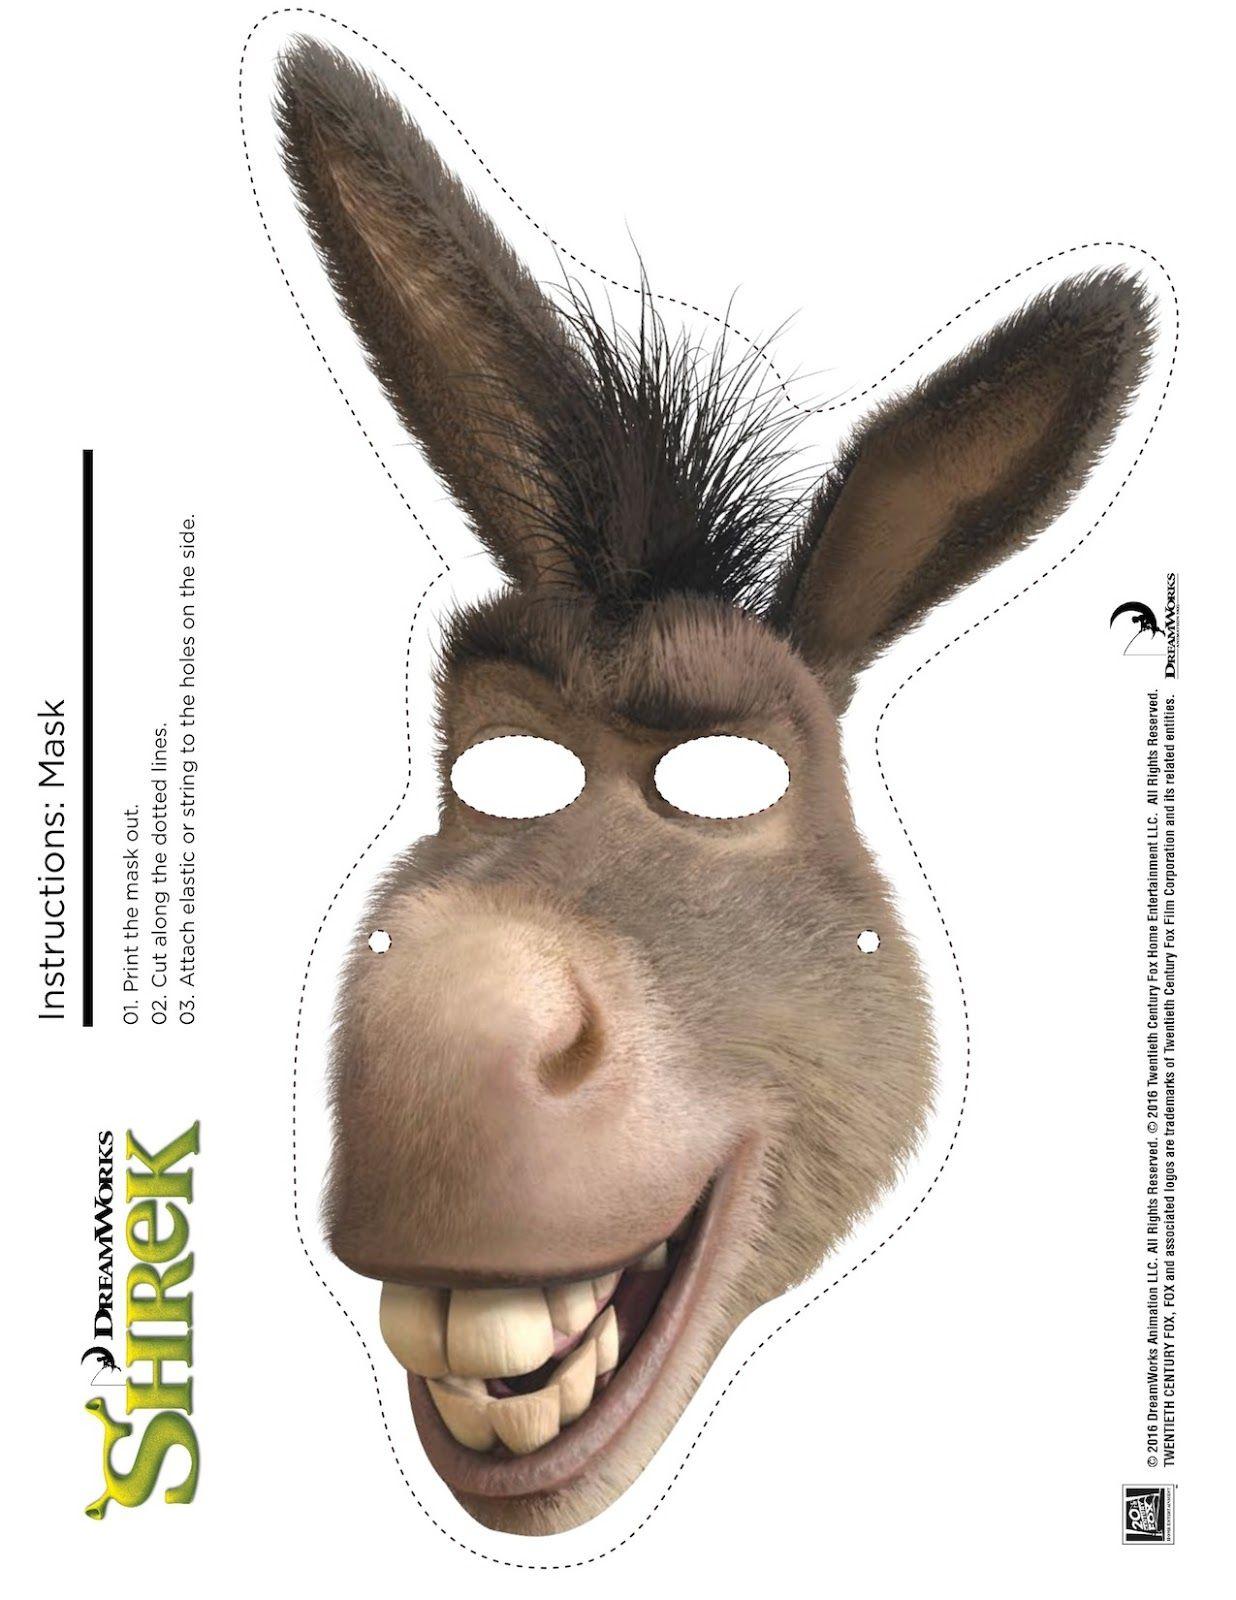 Shrek Photo Booth Props: Free Printable Shrek Mask | Shrek Birthday - Free Printable Shrek Birthday Invitations